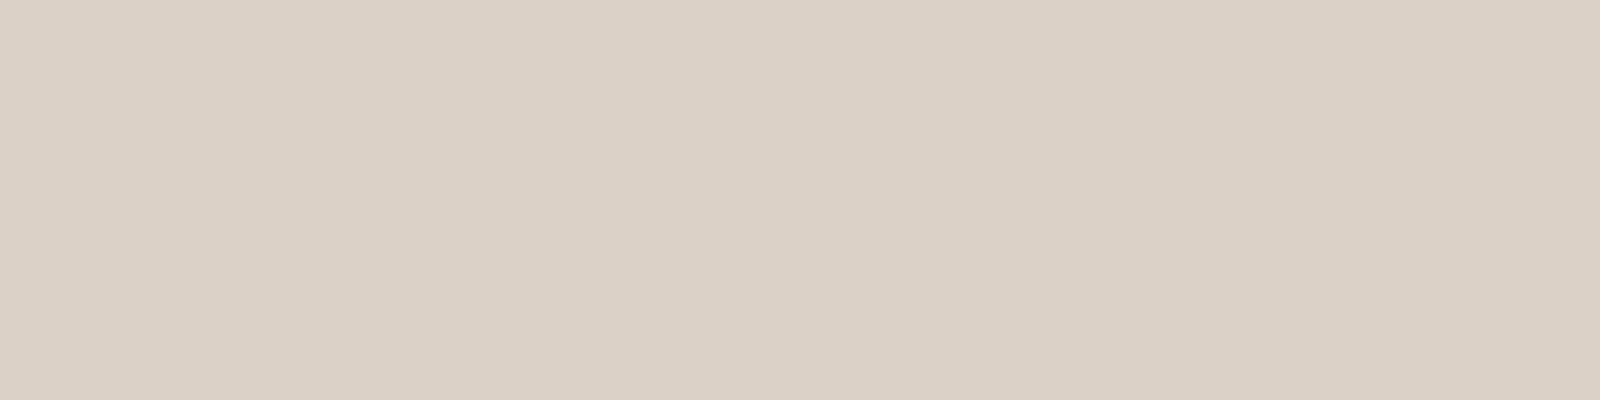 819 Herringbone Gutter Color